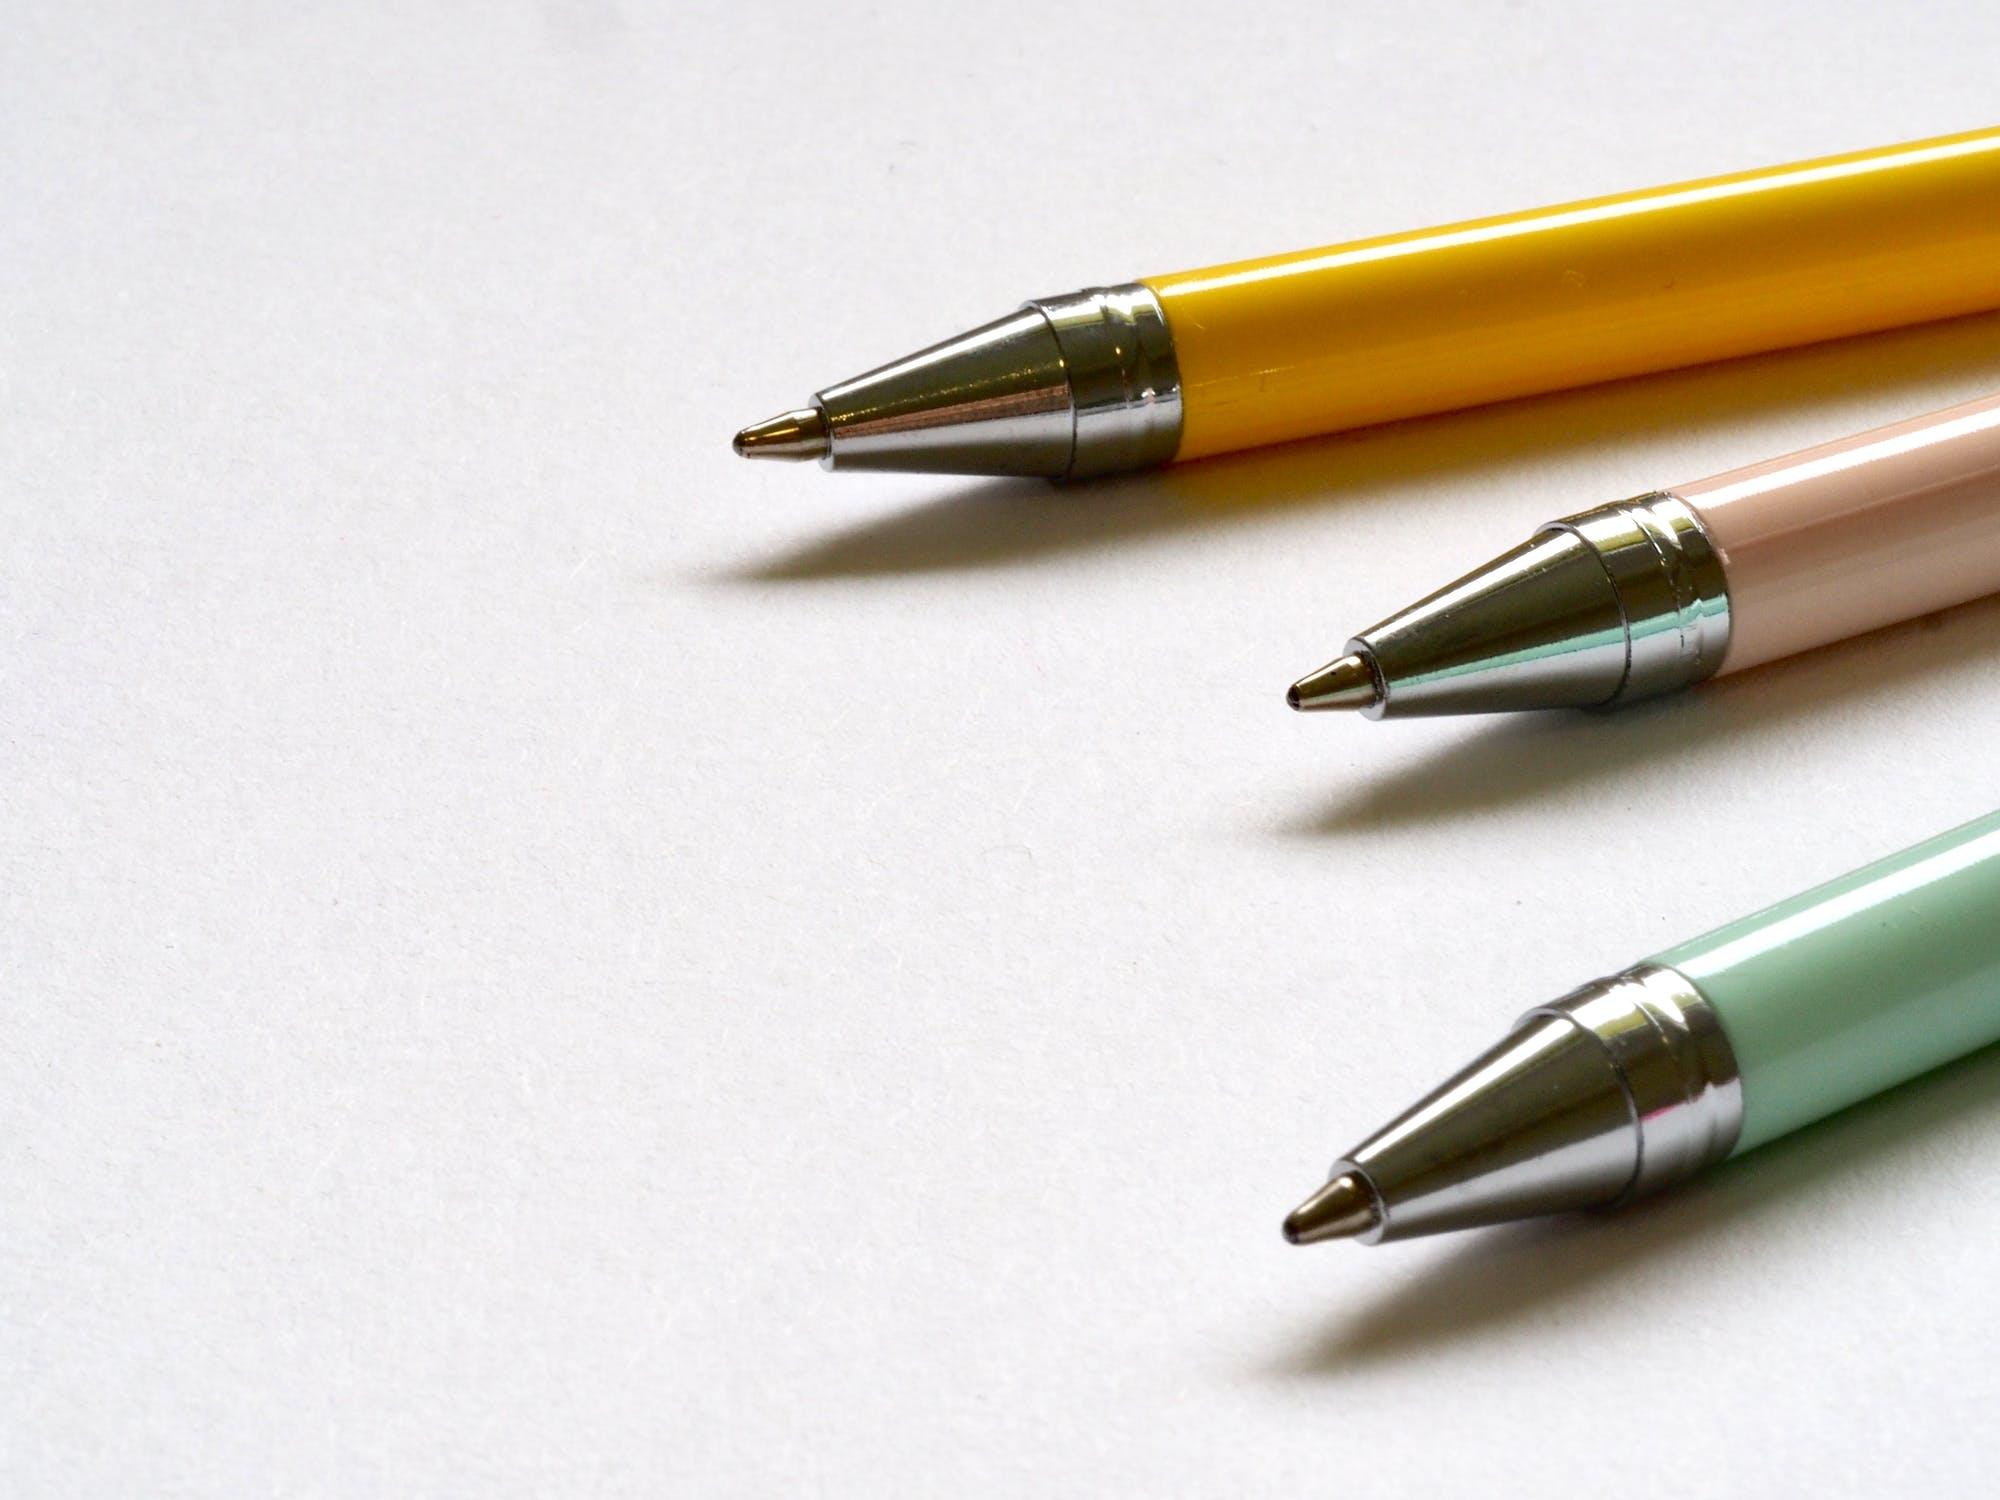 pennen bedrukken artikel